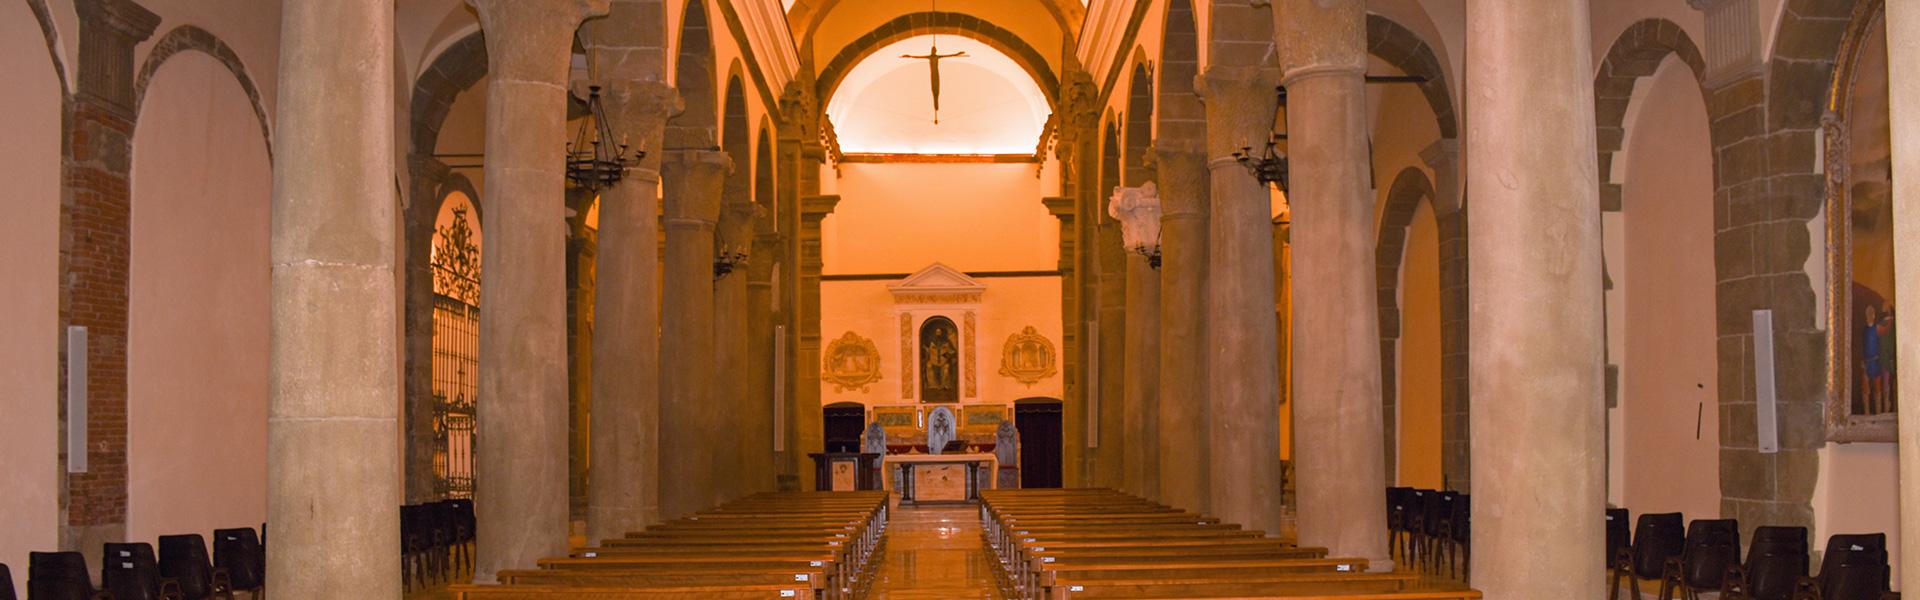 chiesa-san-silvetro-troina1